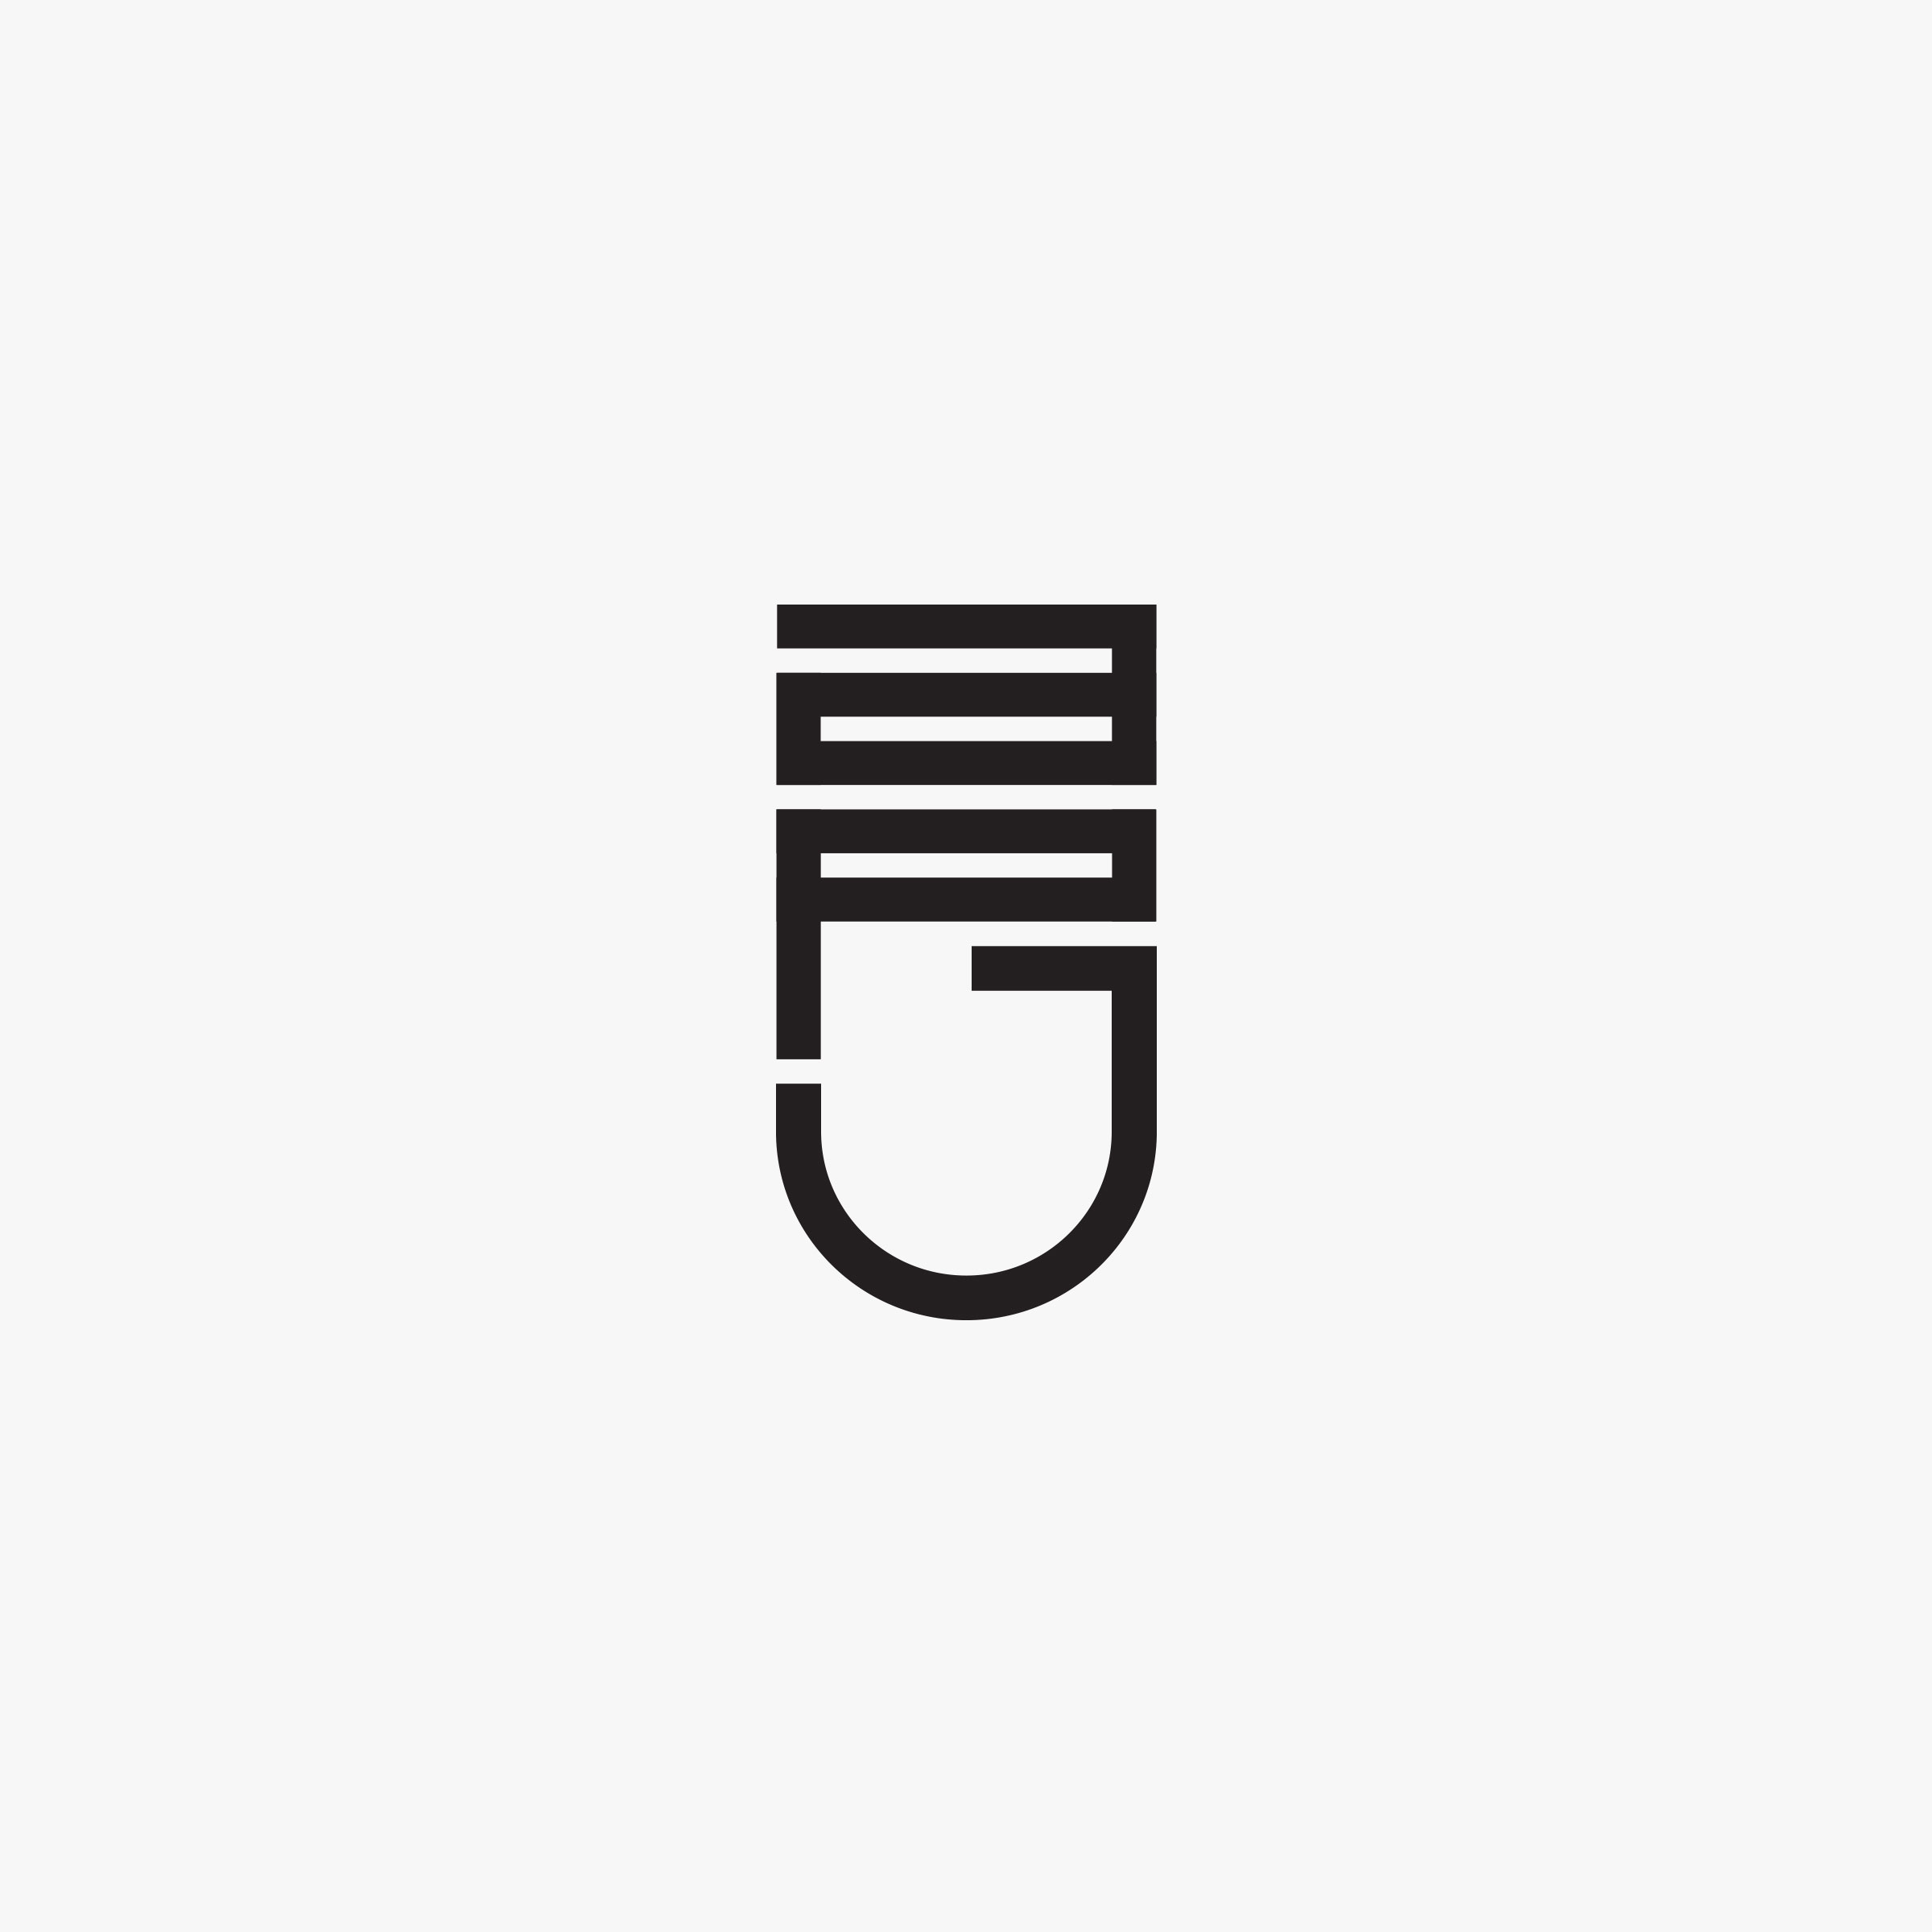 monogram-logo-design-by-create.jpg